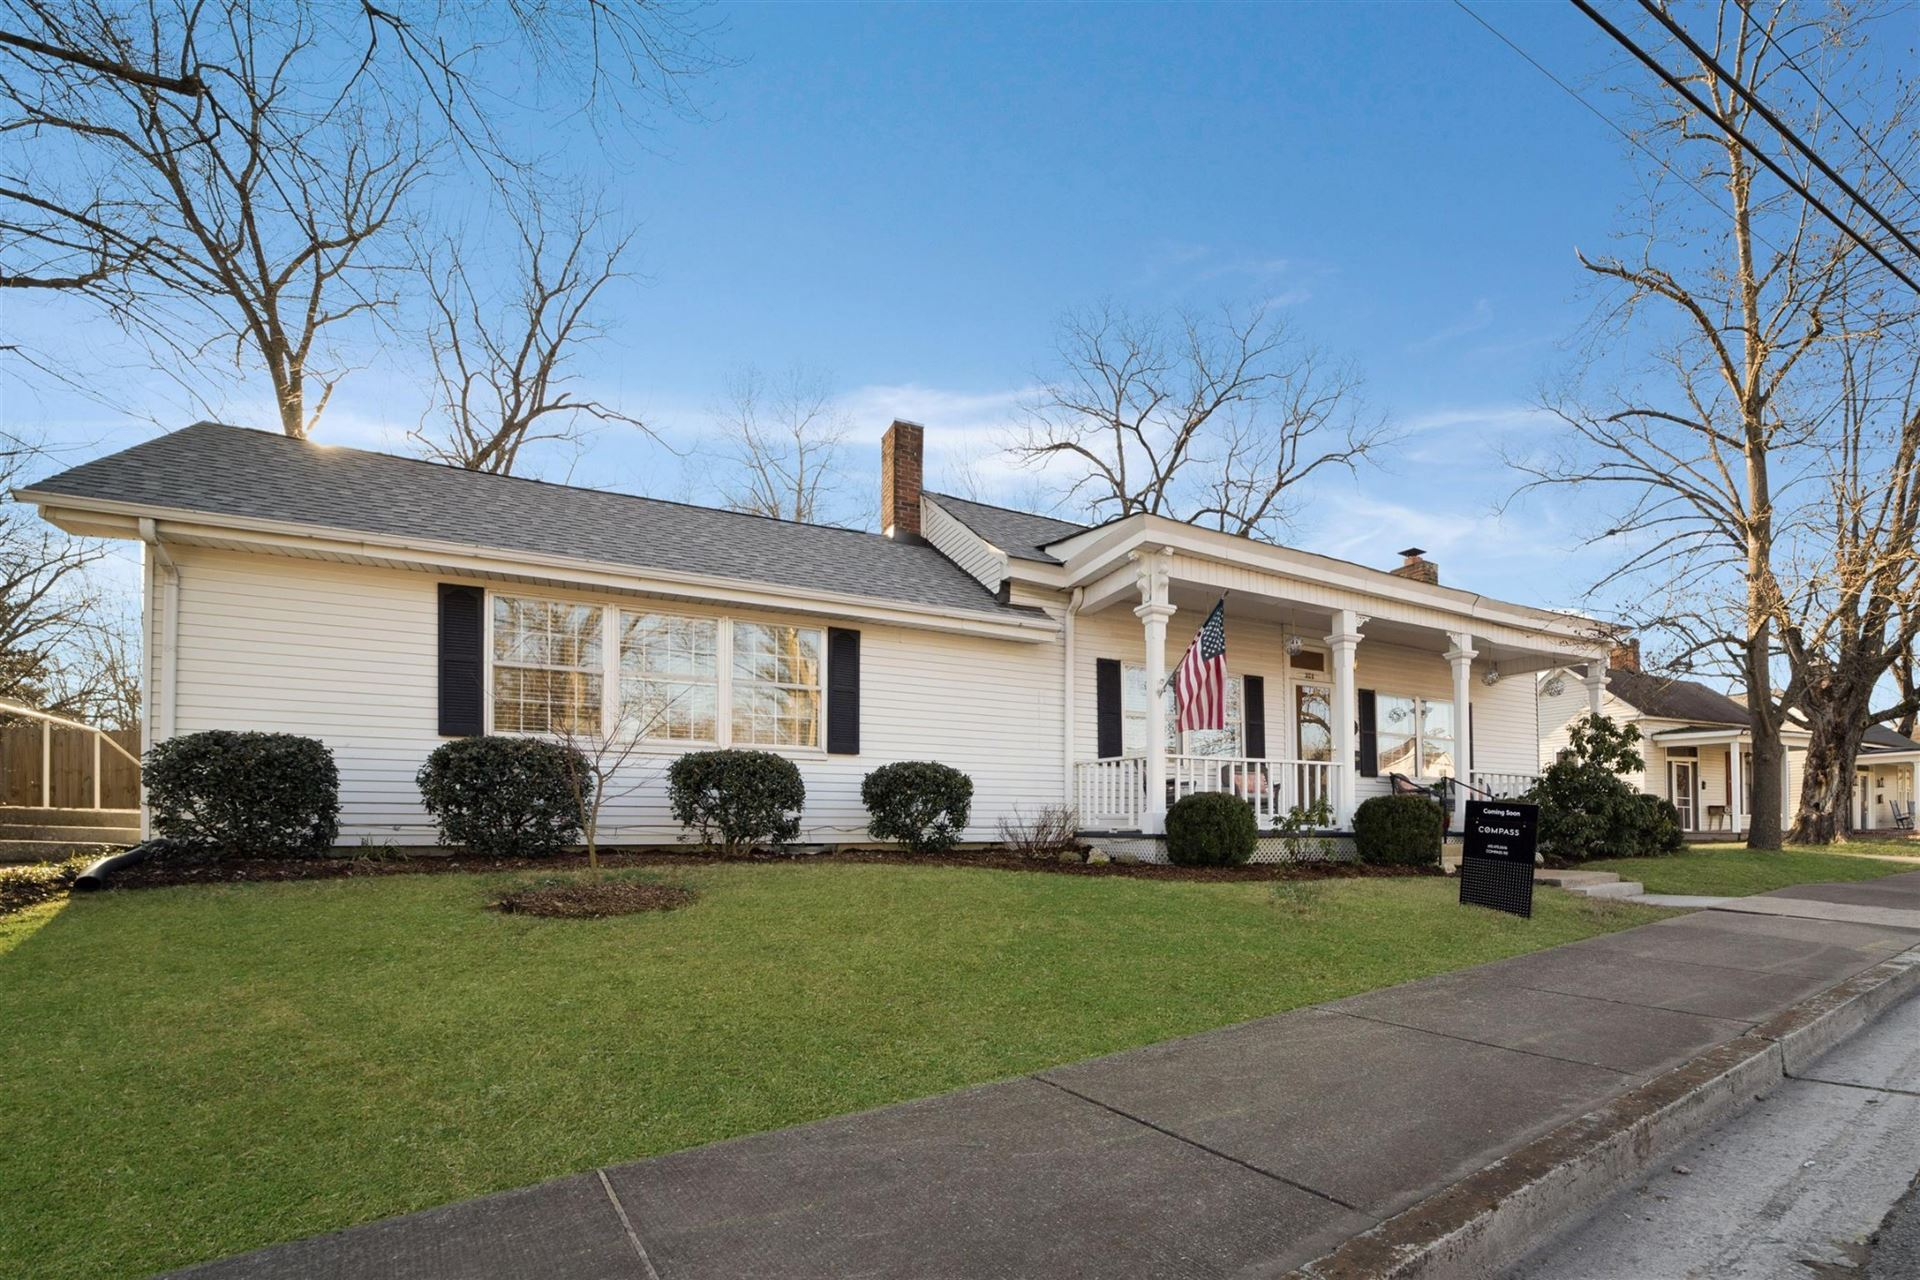 324 3rd Ave S, Franklin, TN 37064 - MLS#: 2249023